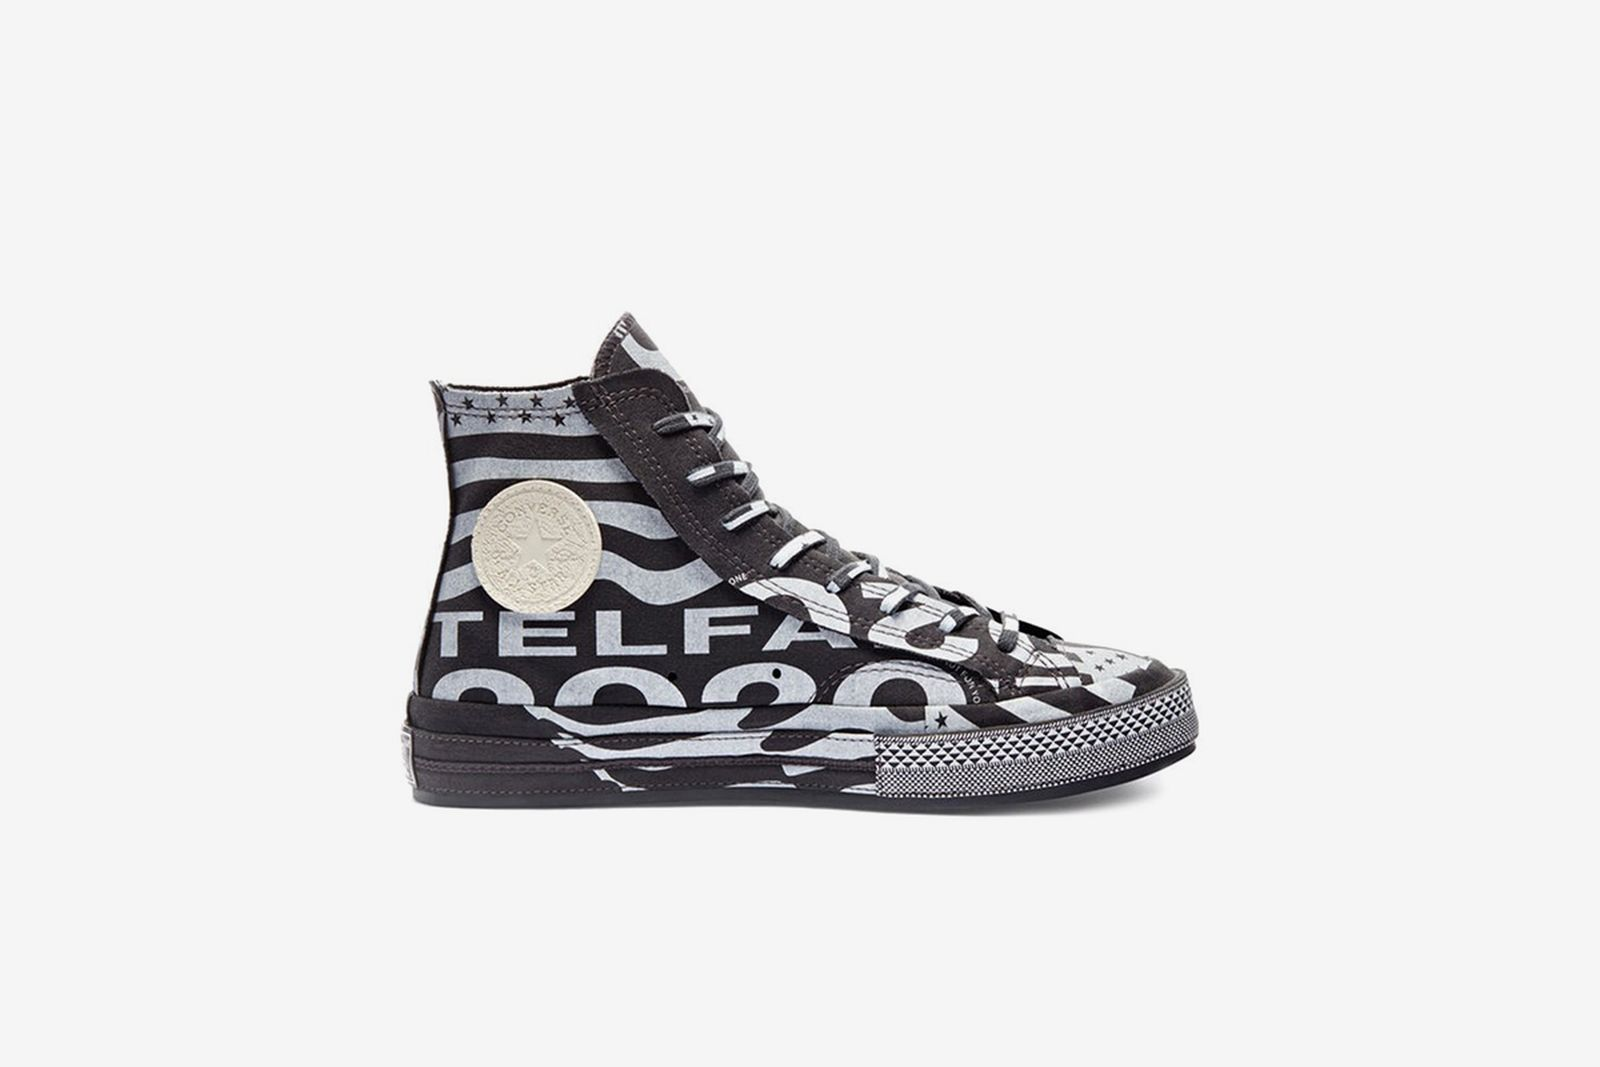 telfar-converse-chuck-70-release-date-price-09